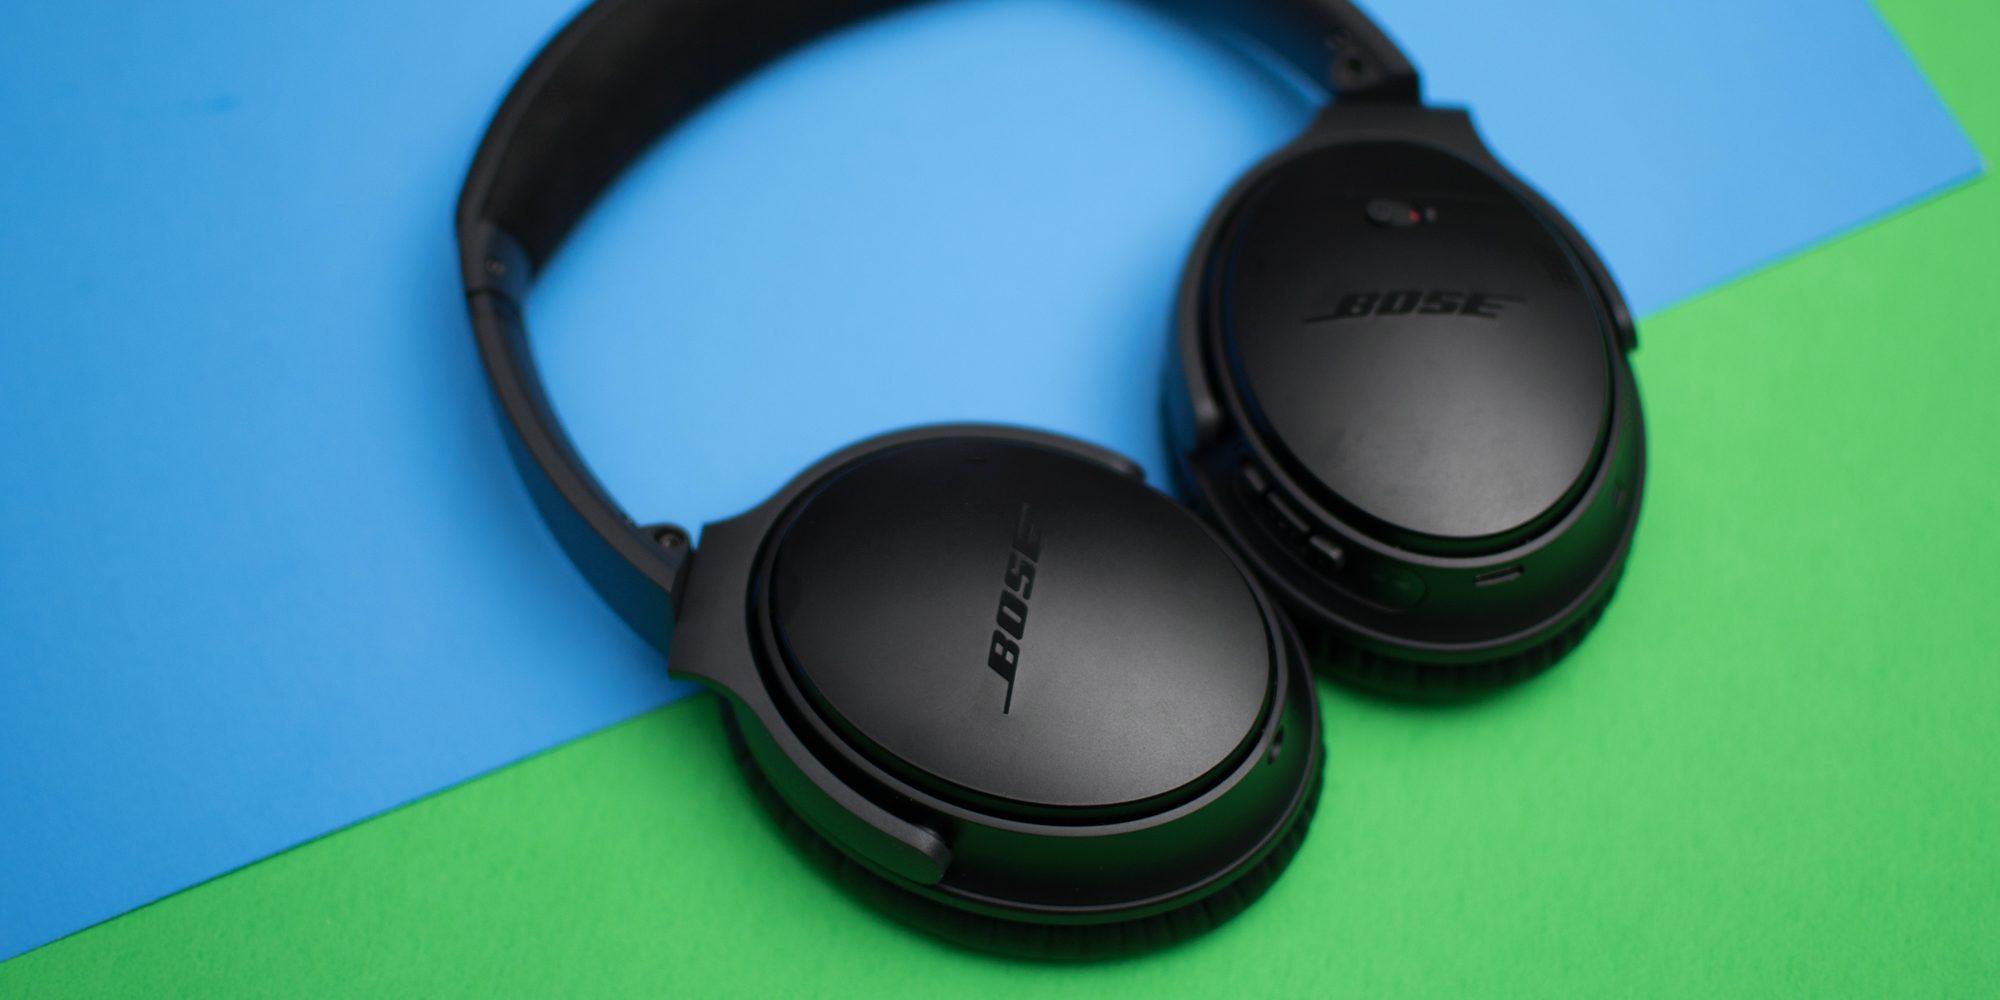 Score a rare discount on Bose QuietComfort 35 SII Wireless Headphones for $274 (Reg. $349)